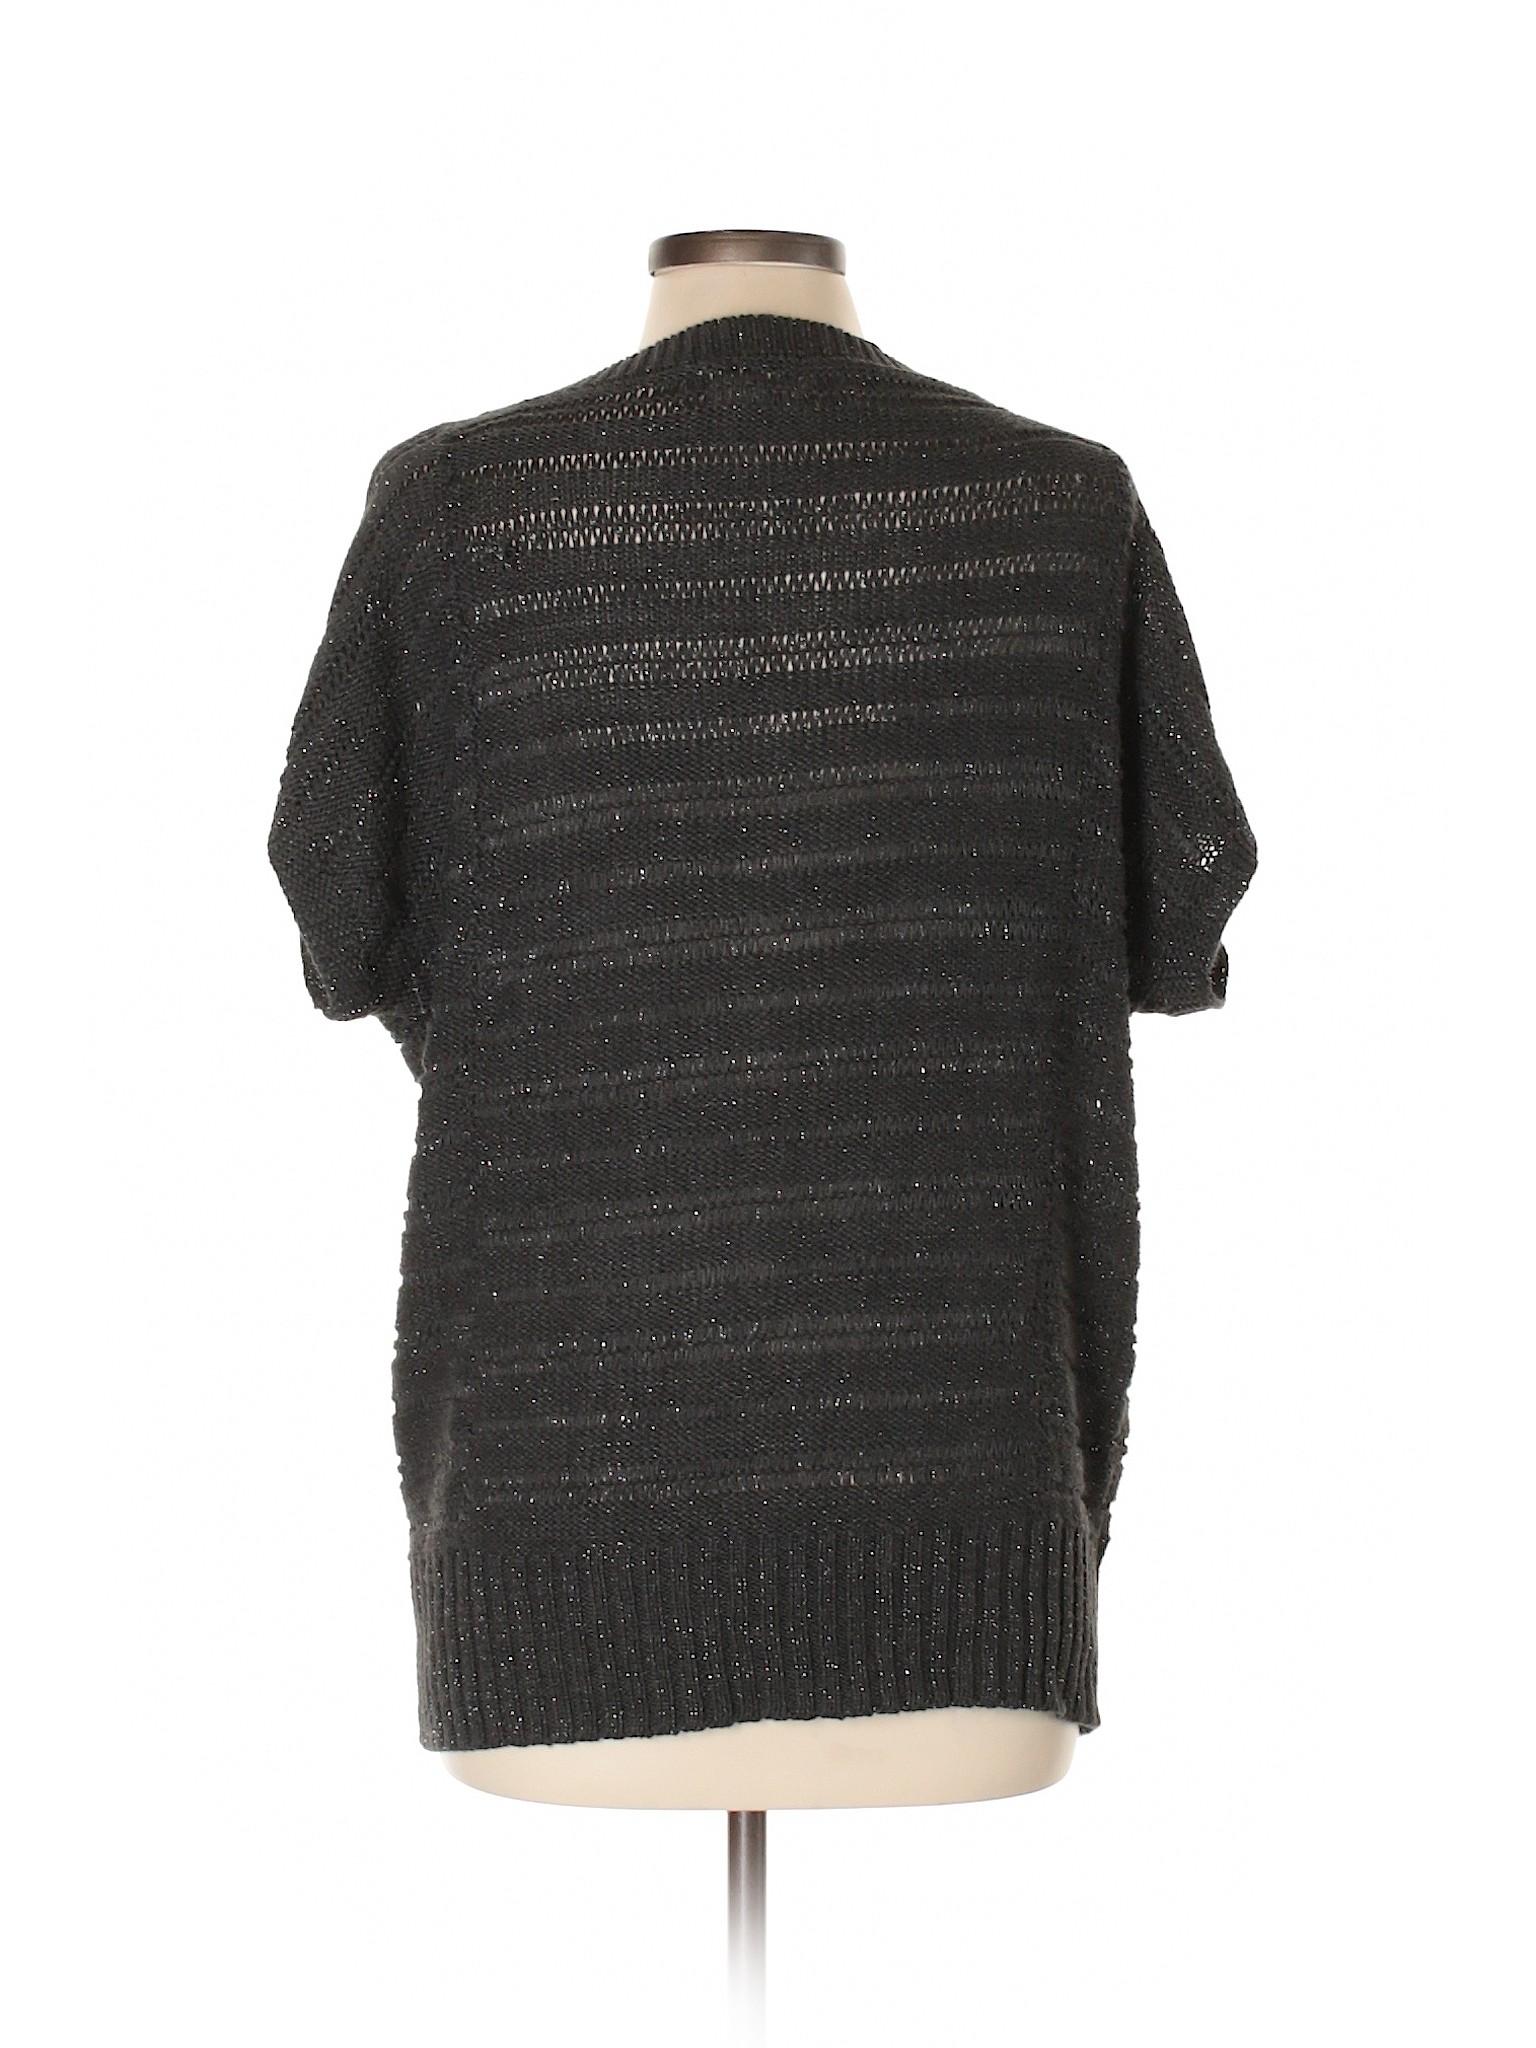 Boutique Sweater winter winter winter DKNY Pullover Boutique Boutique winter Boutique DKNY Sweater Pullover Sweater DKNY Pullover qt0tAr